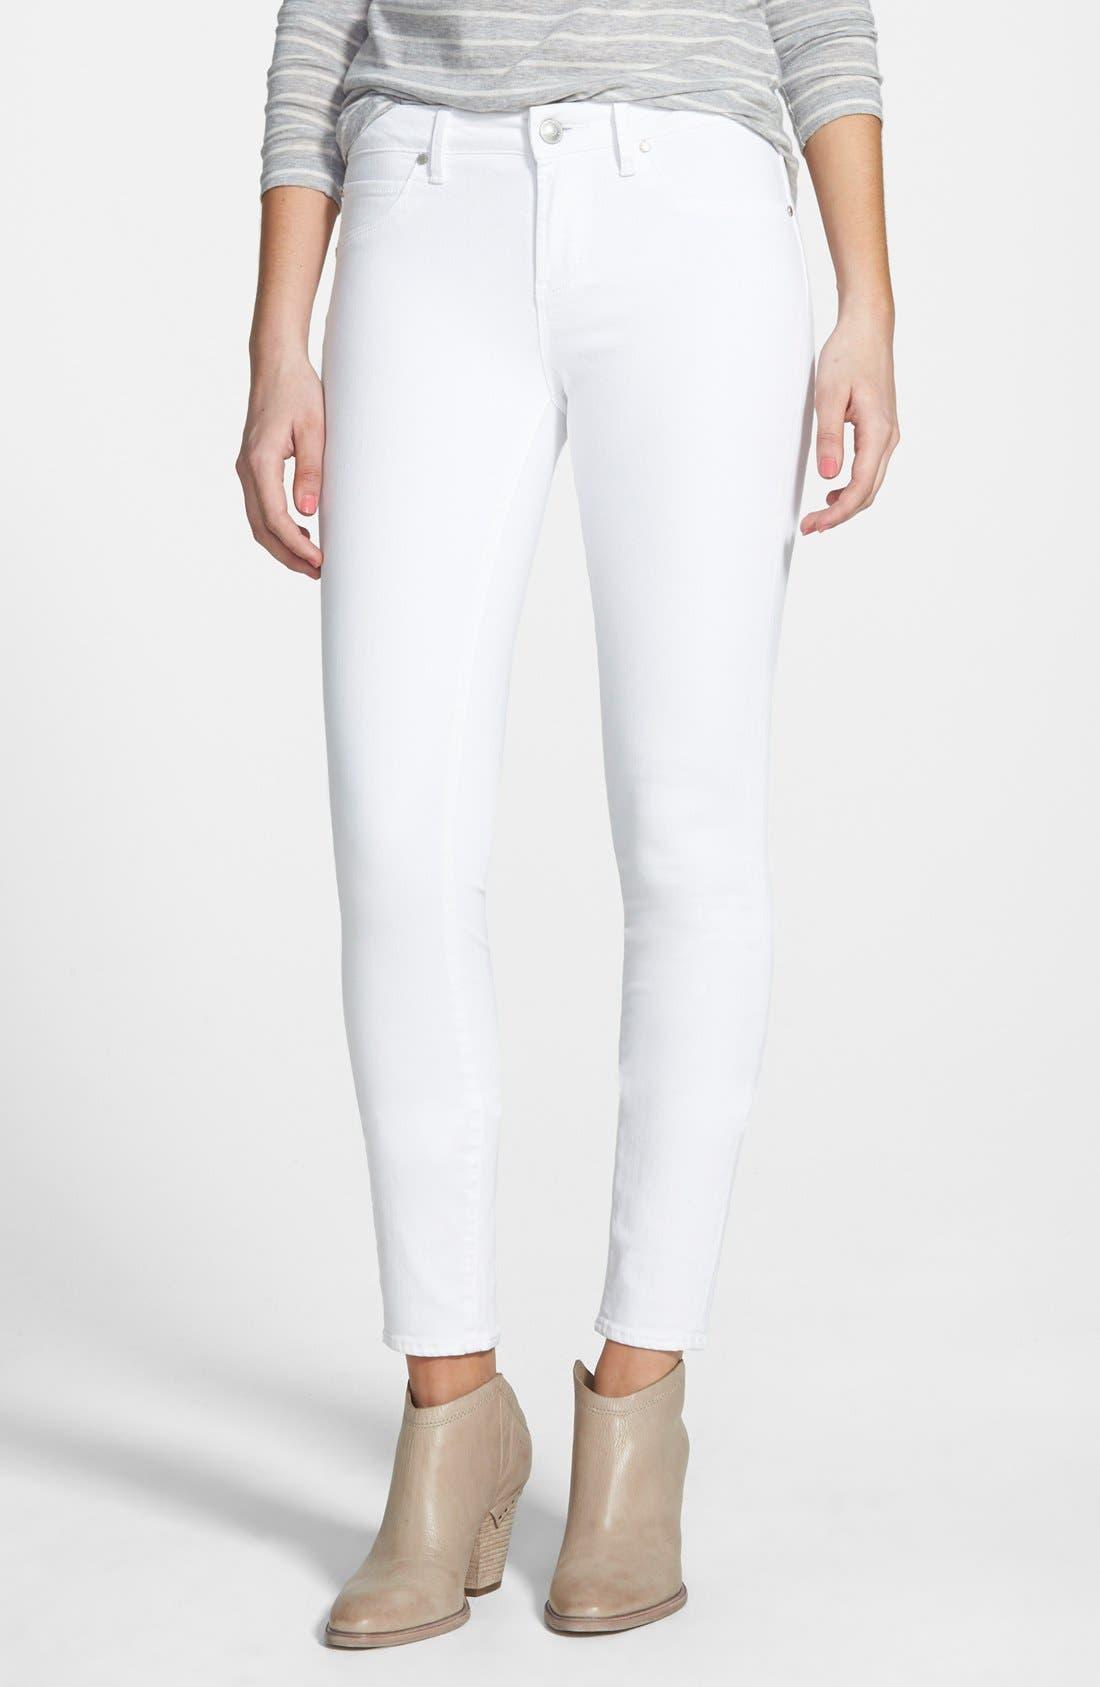 'Sarah' Skinny Jeans,                             Main thumbnail 1, color,                             100